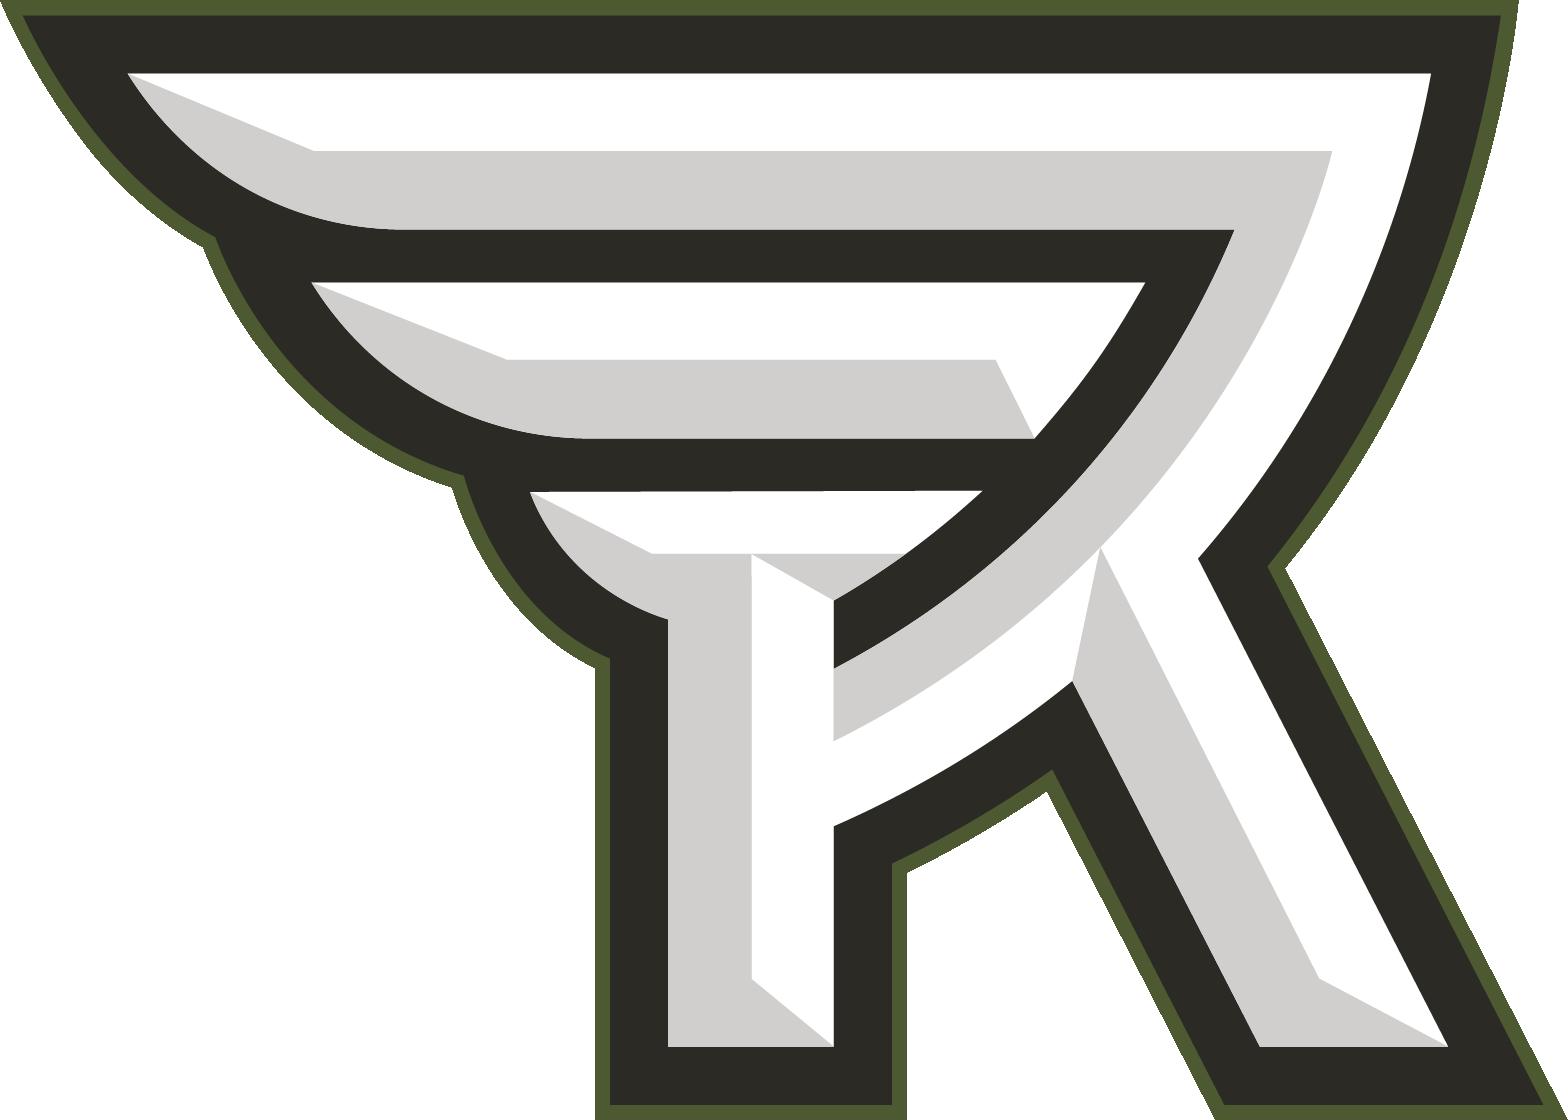 Rochester Knighthawks